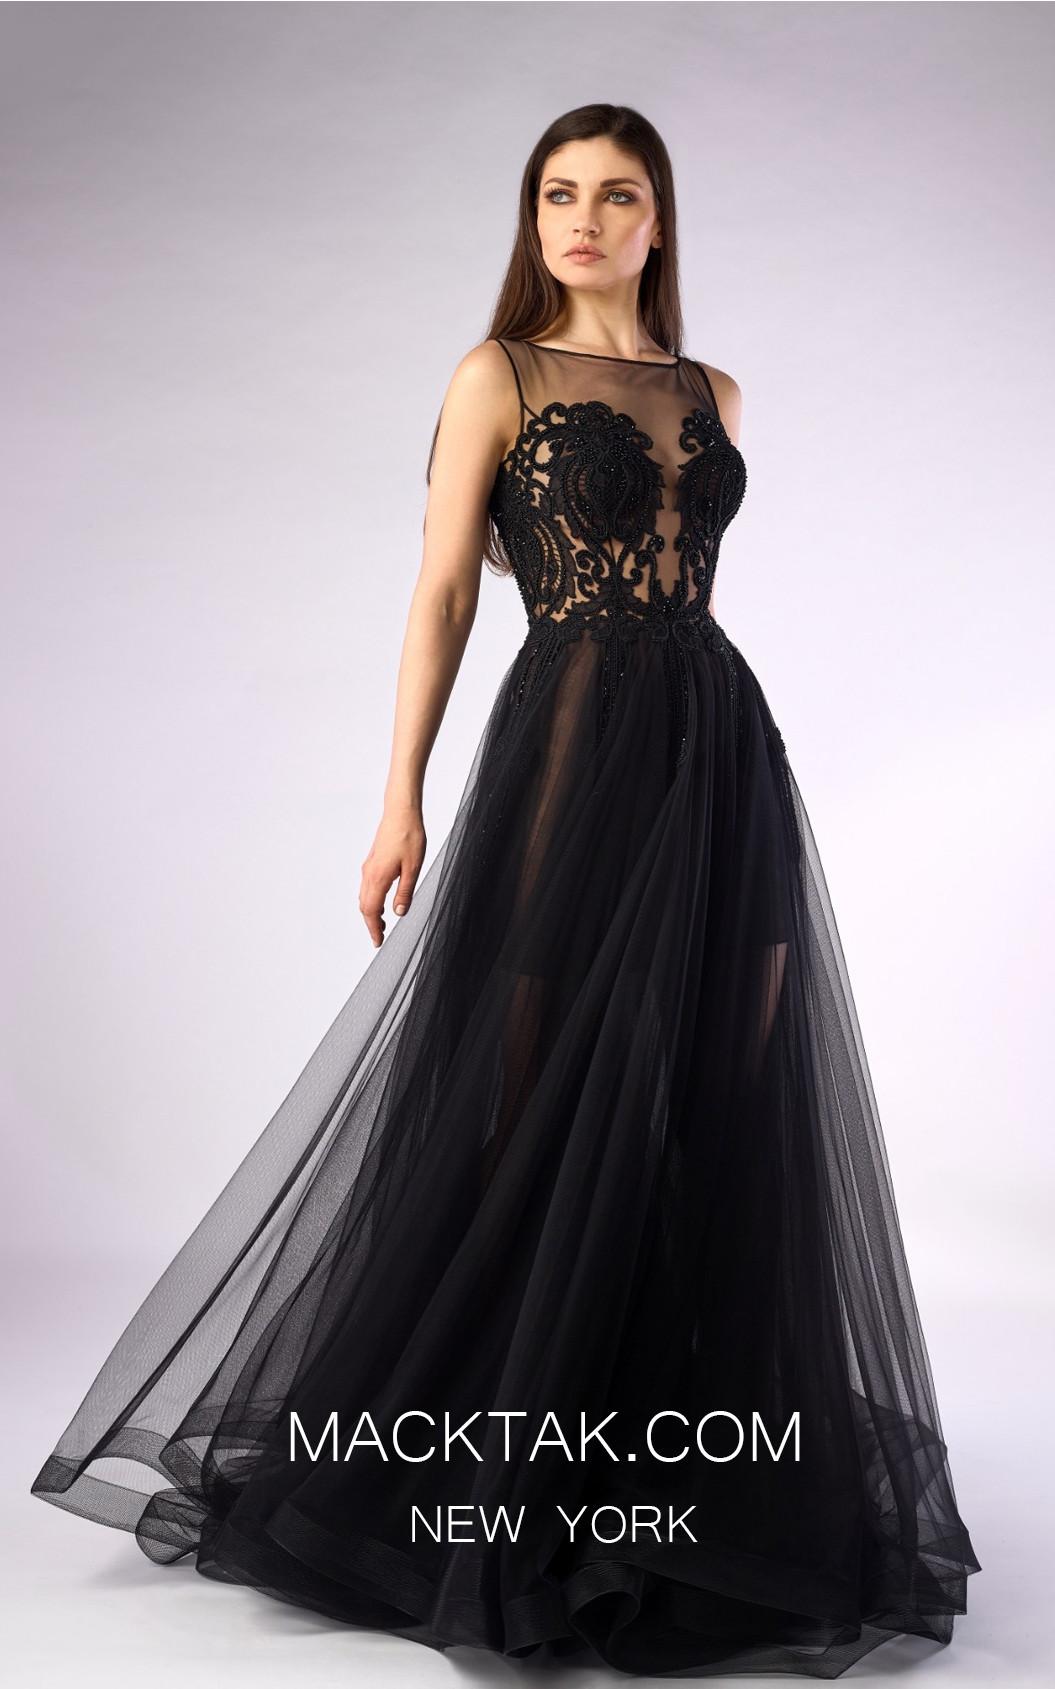 Gatti Nolli OP4782 Front Dress